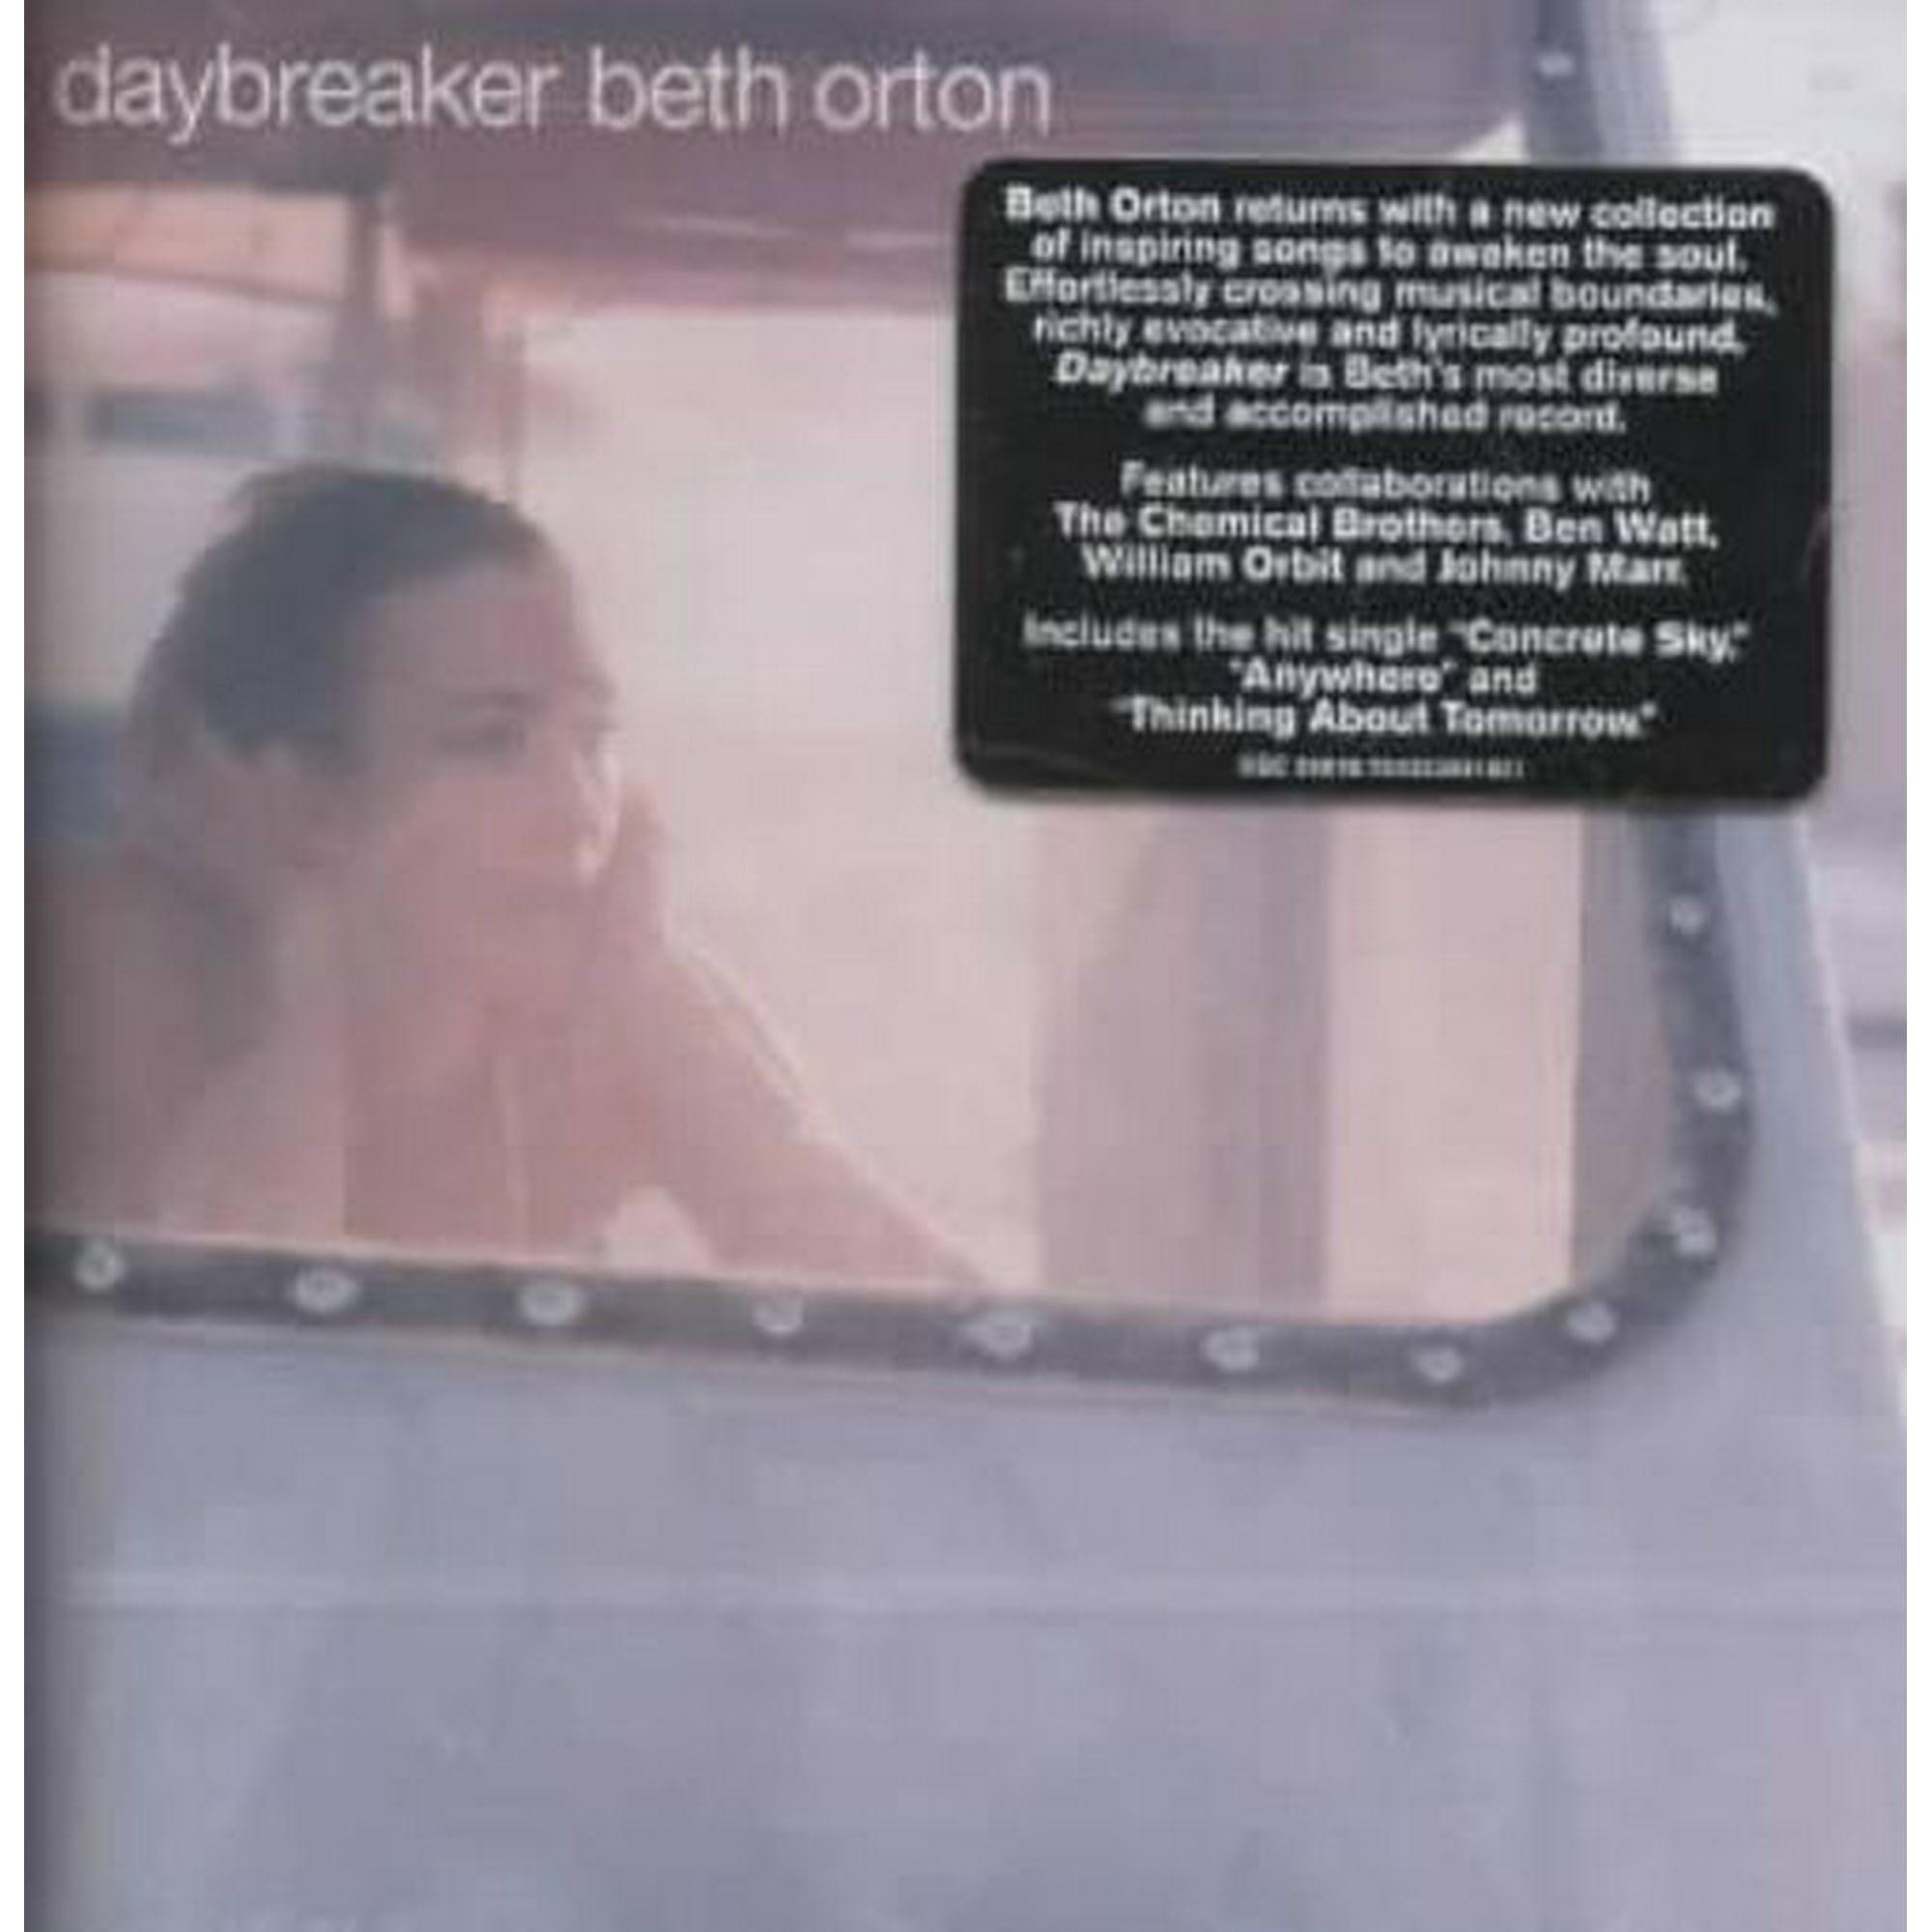 Beth Orton Daybreaker CD | Walmart Canada